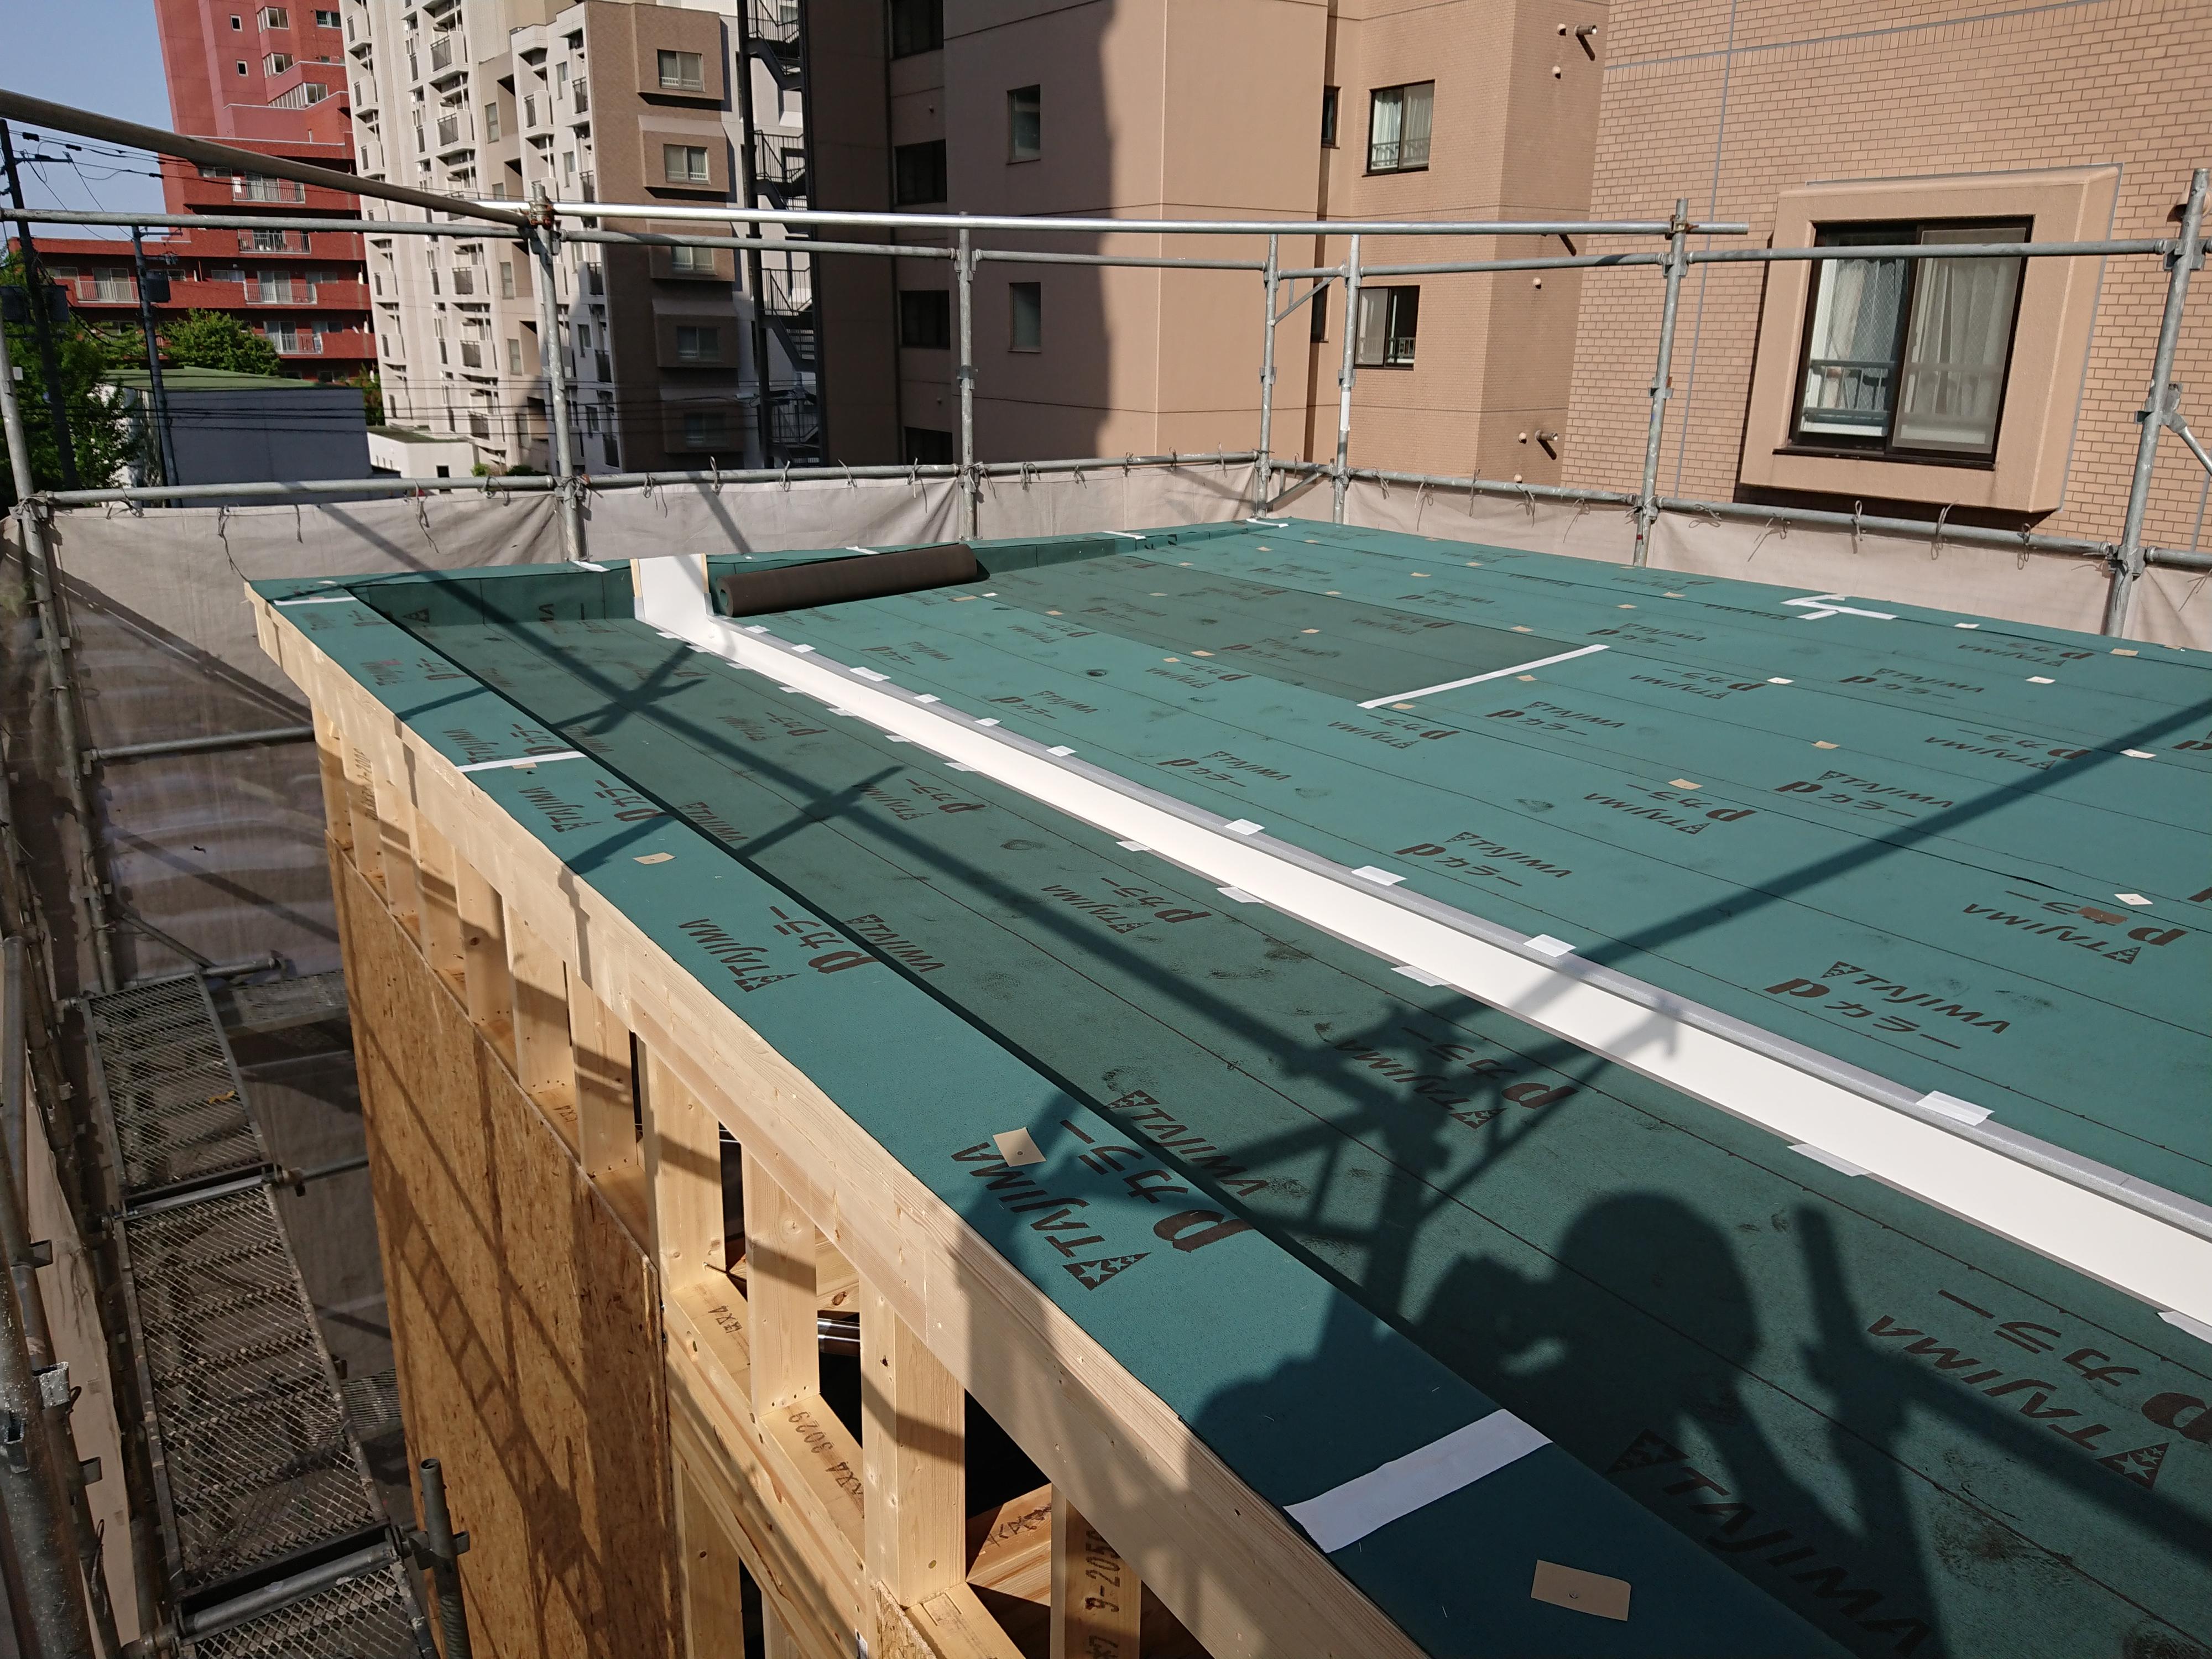 琴似 ラーメン店新築工事 ⑧躯体・屋根工事